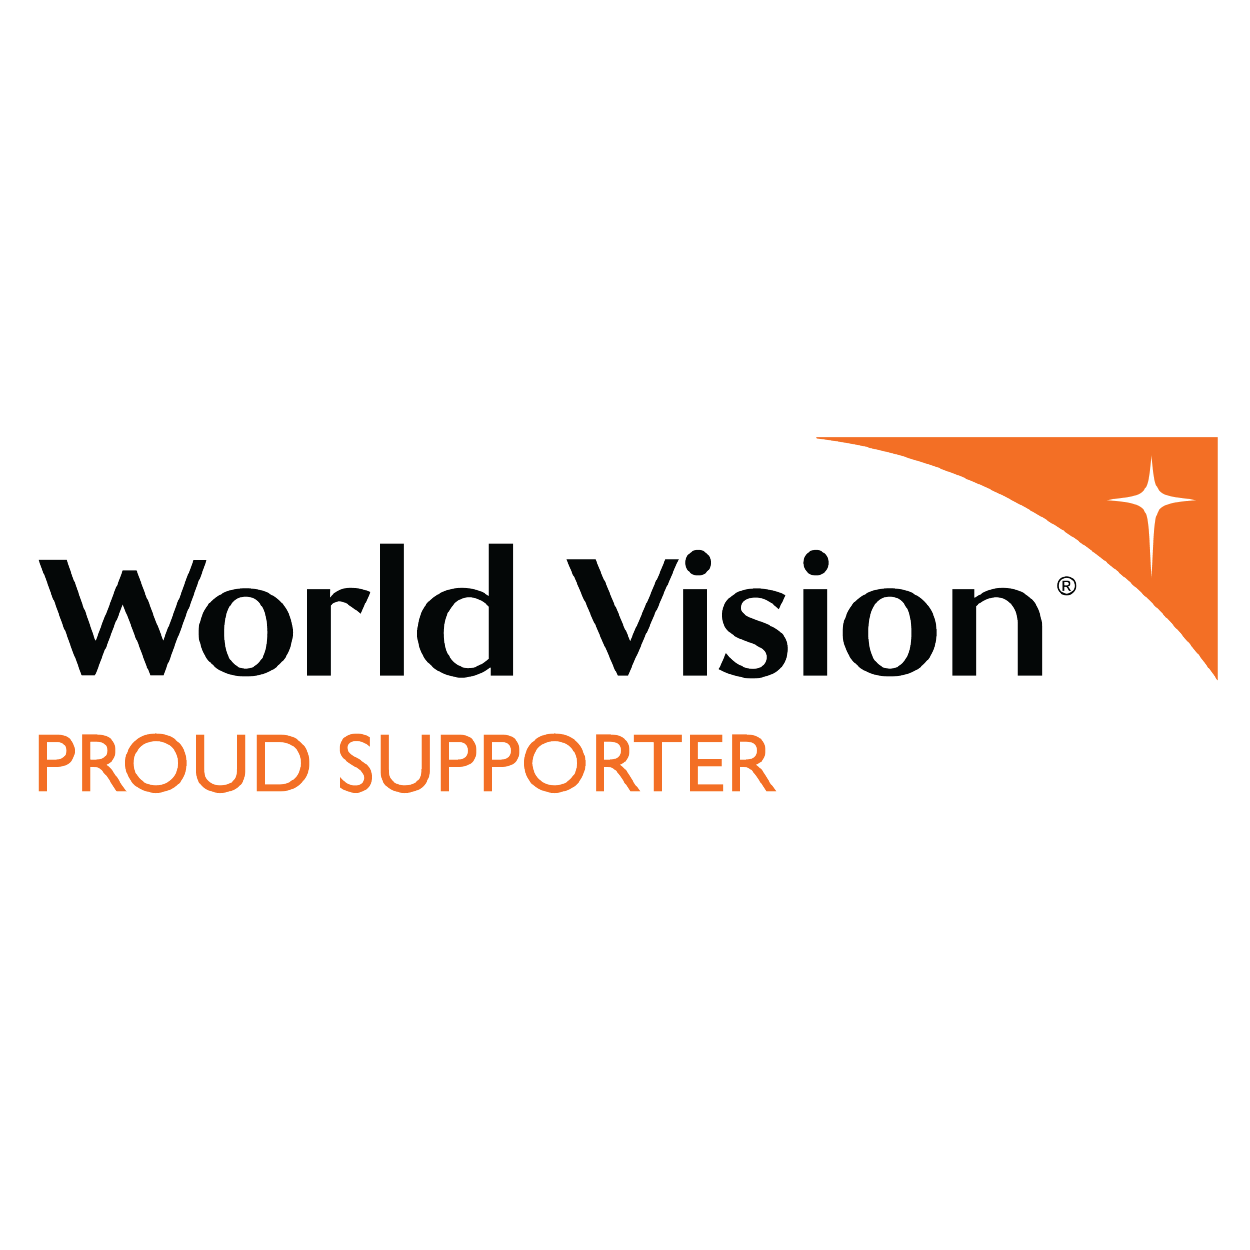 world-vision-01